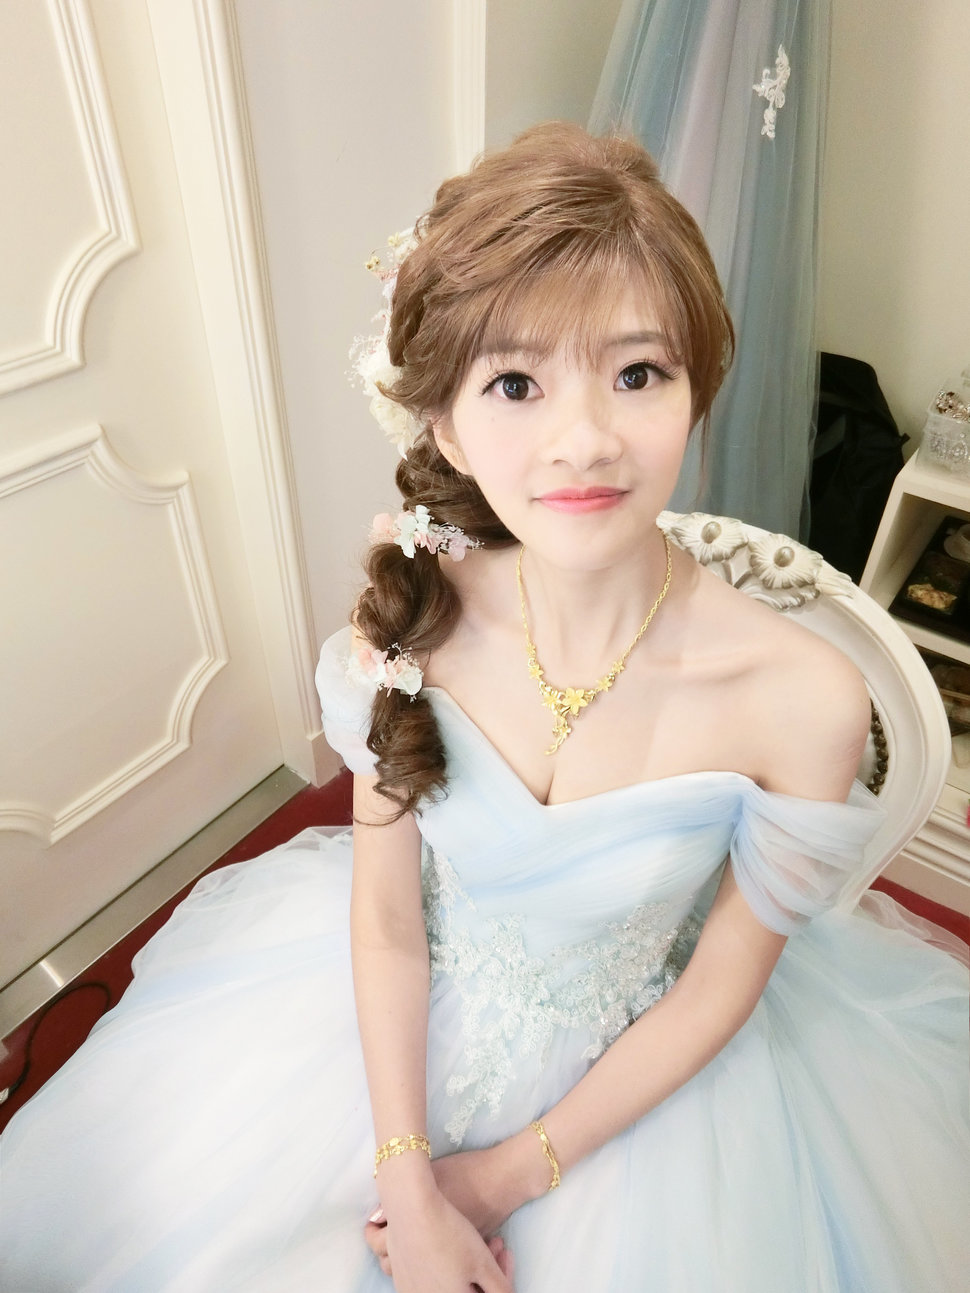 CIMG0145 - 新秘沛淳hair & make up - 結婚吧